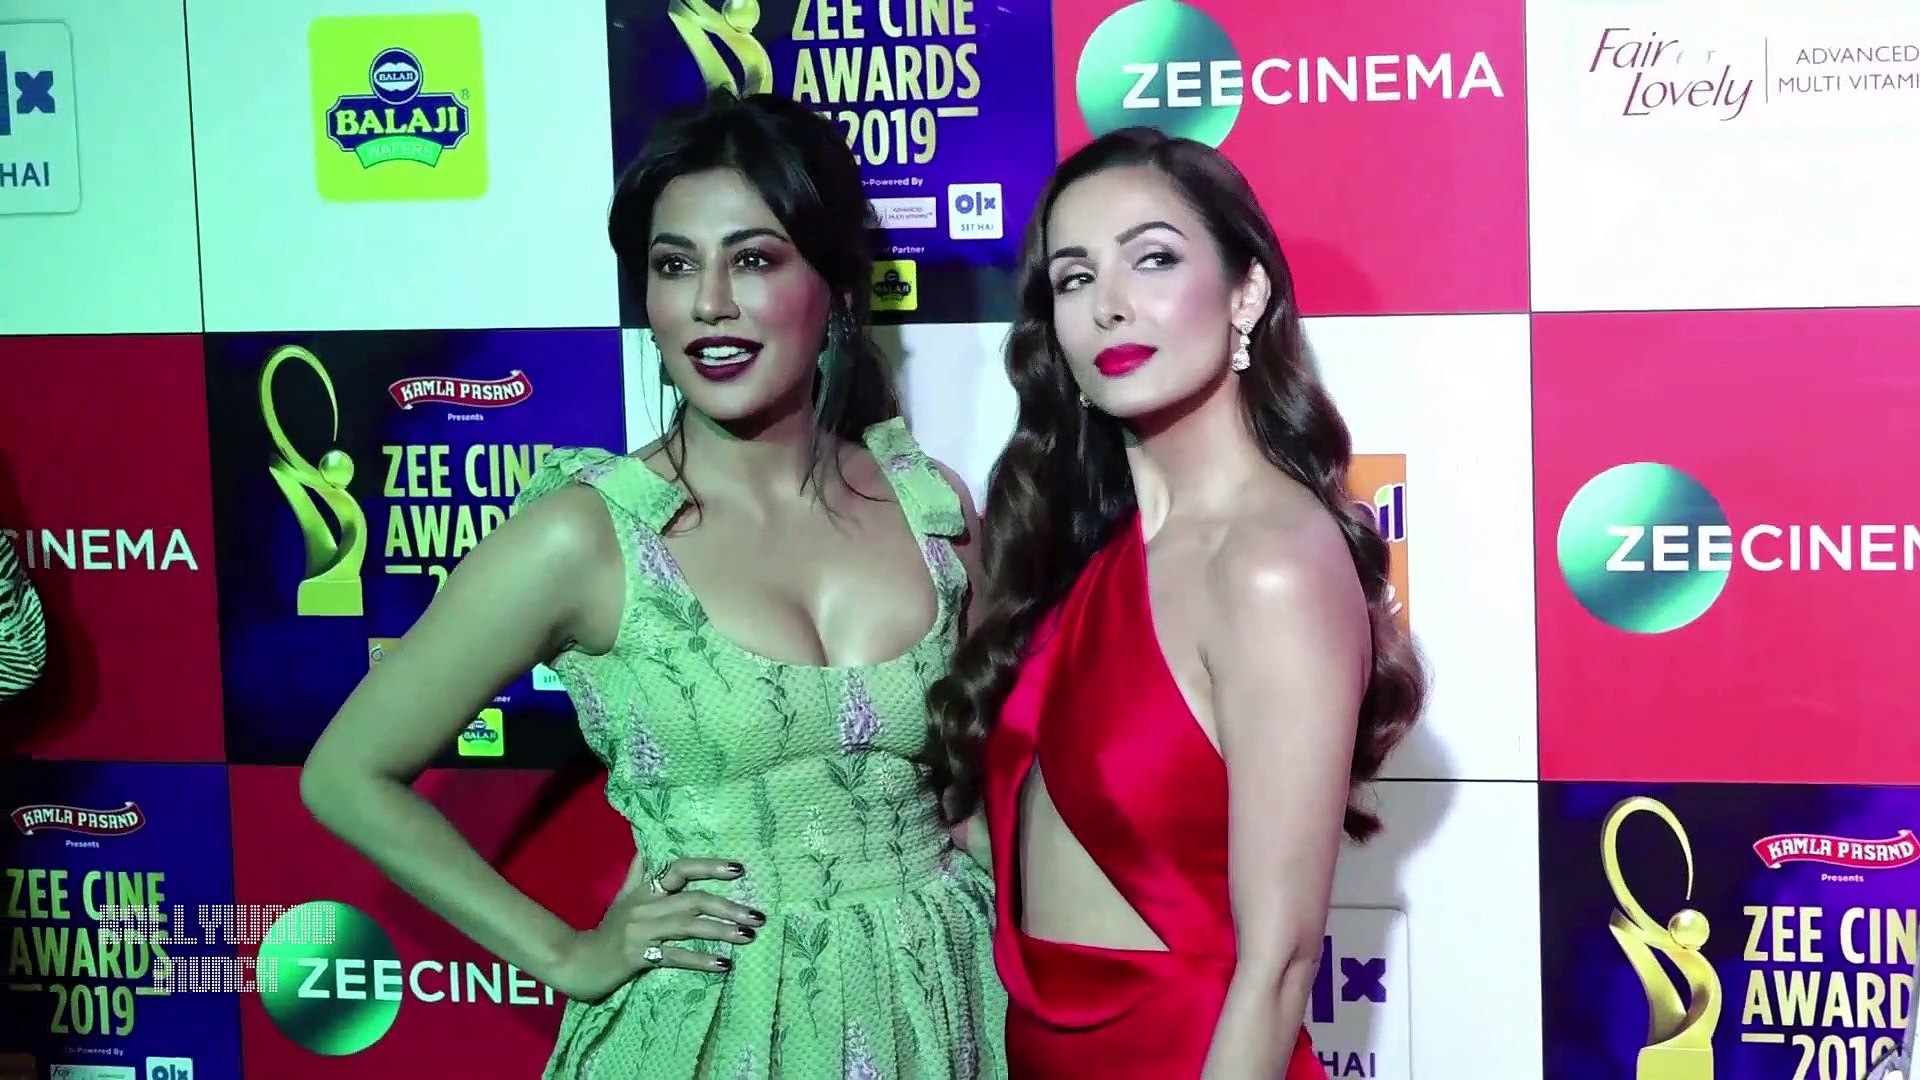 Zee Cine Awards 2019 Full Show Red Carpet Ranveer,  Ranbir,Alia,Deepika,KatrinaJanhvi,Varun